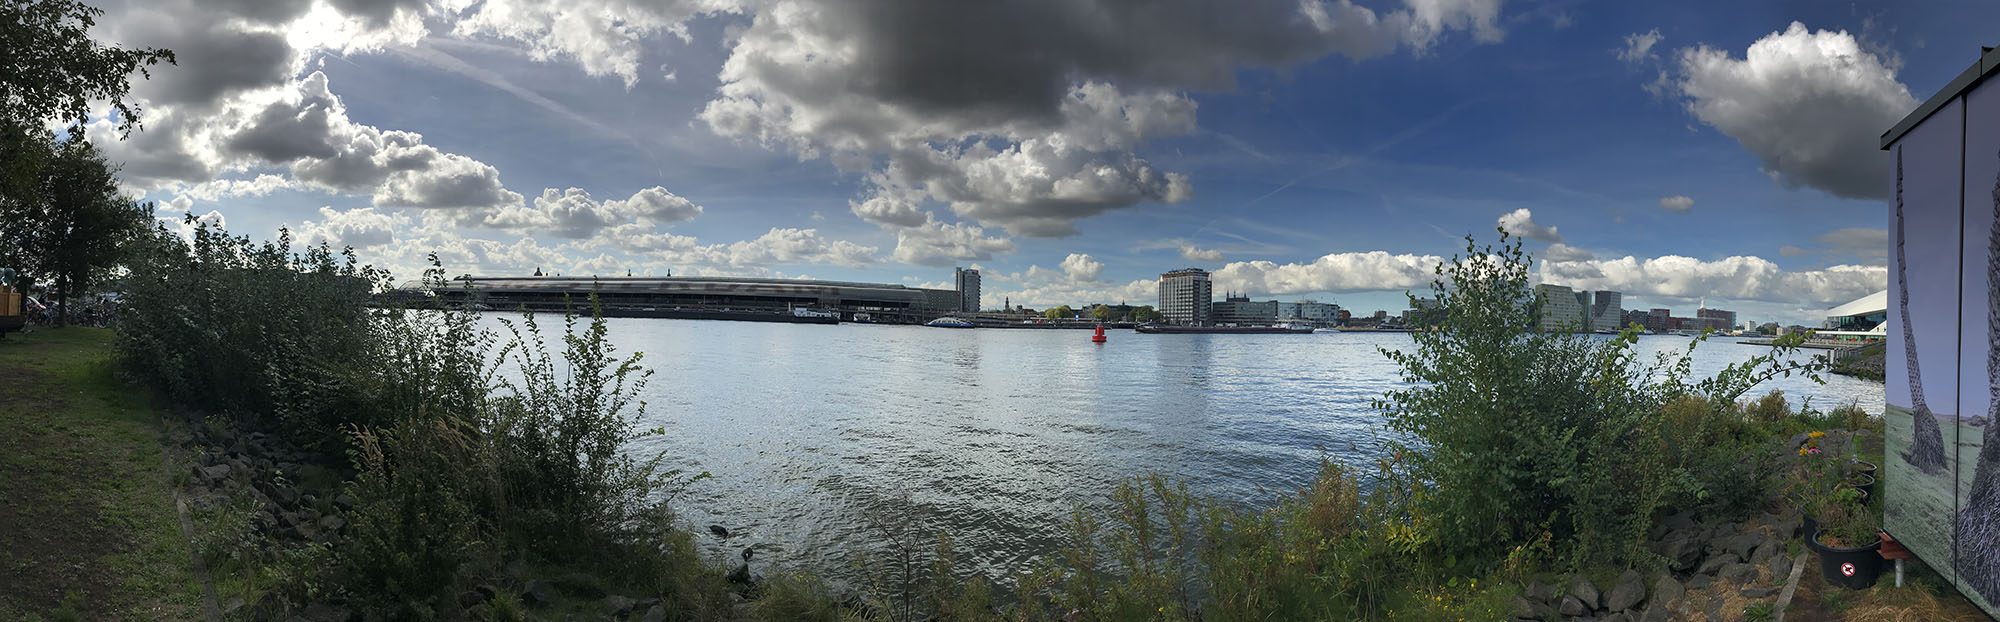 Panorama, foto gemaakt met iPhone 7